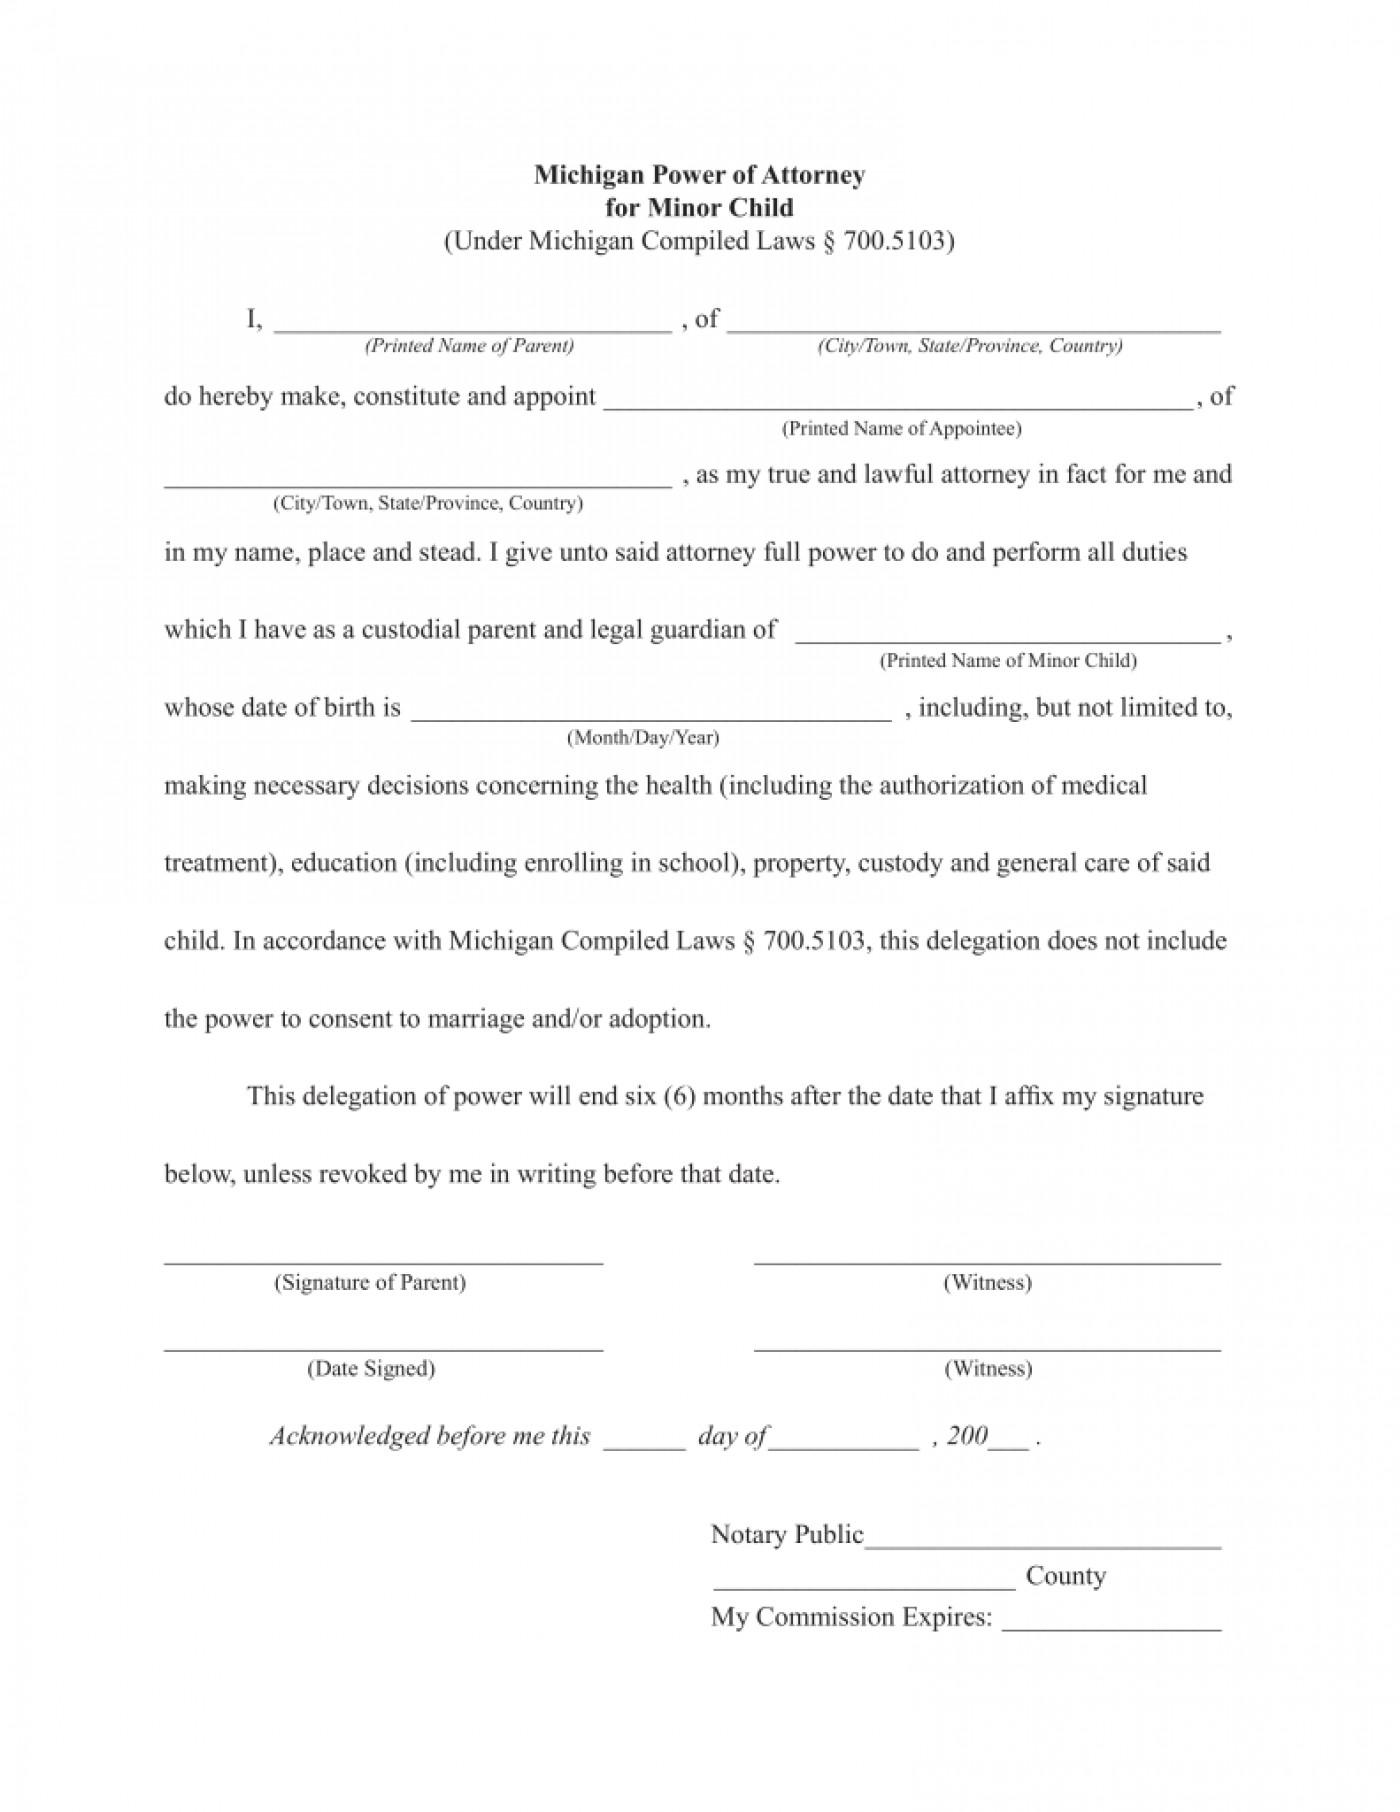 Free Printable Durable Power Of Attorney Form Colorado